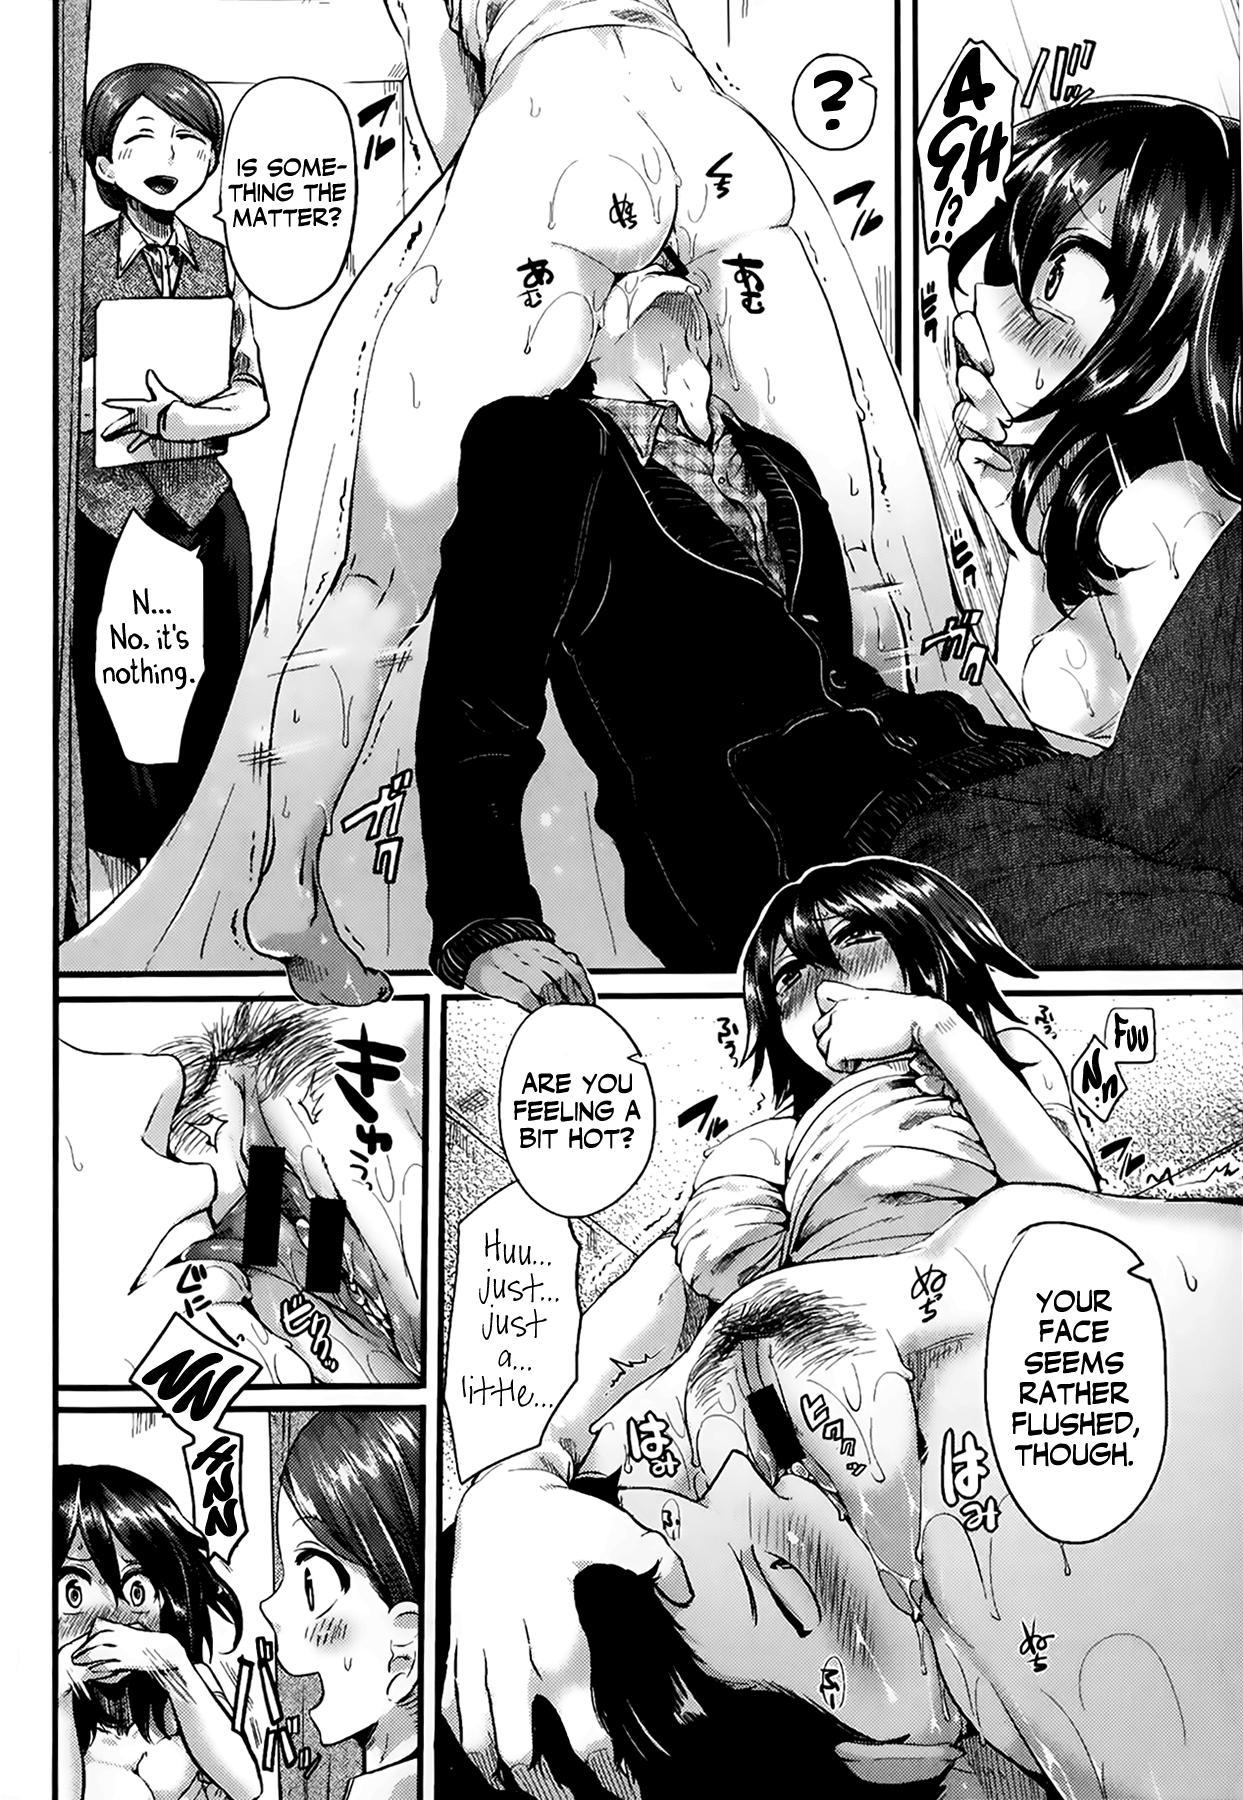 [Doumou] Suki Suki! Onee-chan + Bridal Chapter + -after story- [English] [Life4Kaoru] 32